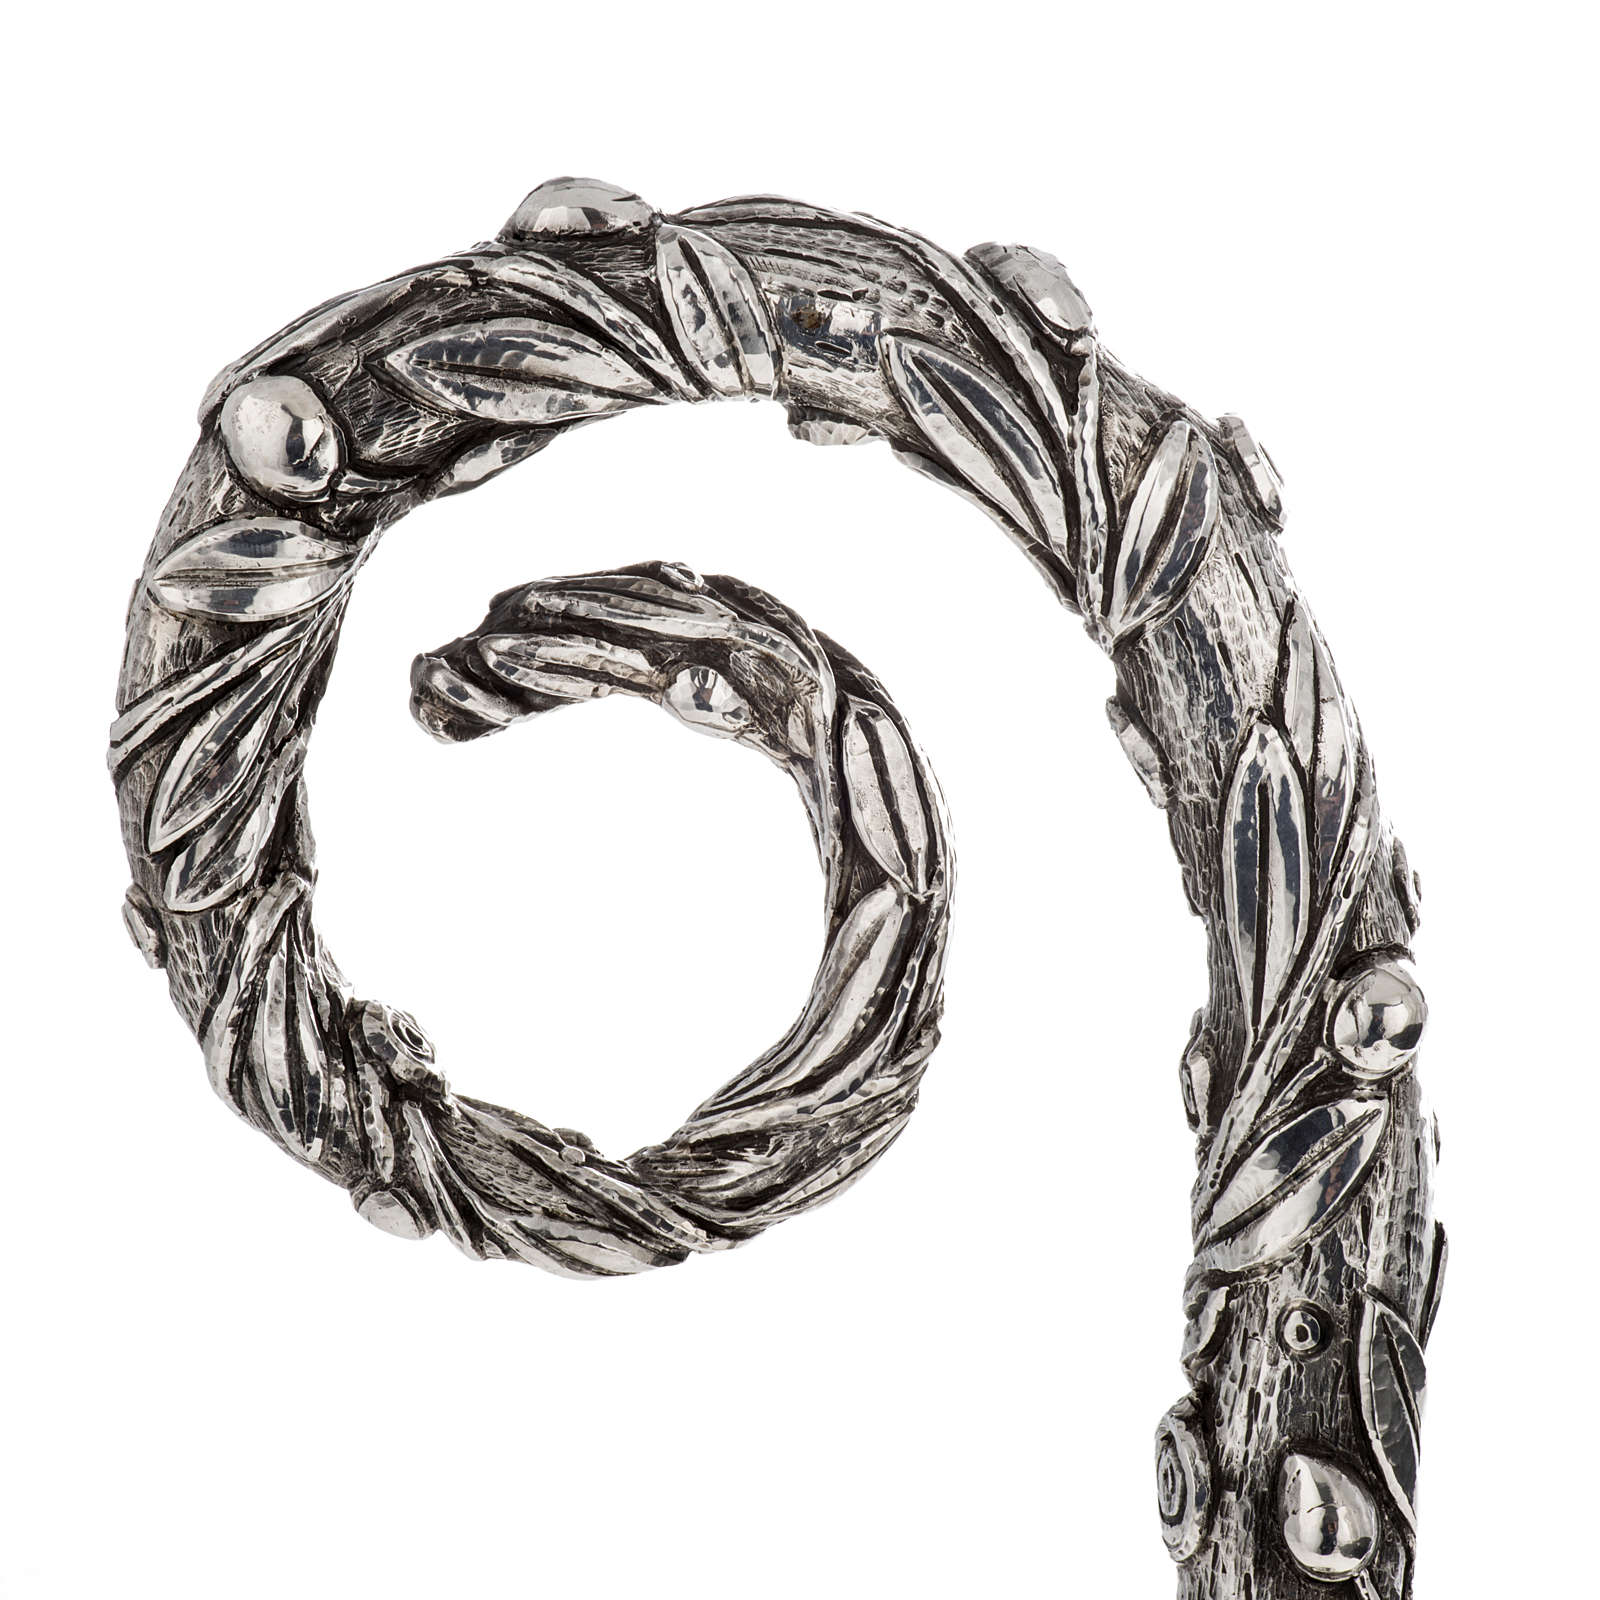 Crozier in 966 silver, electroforming, olive tree model 3